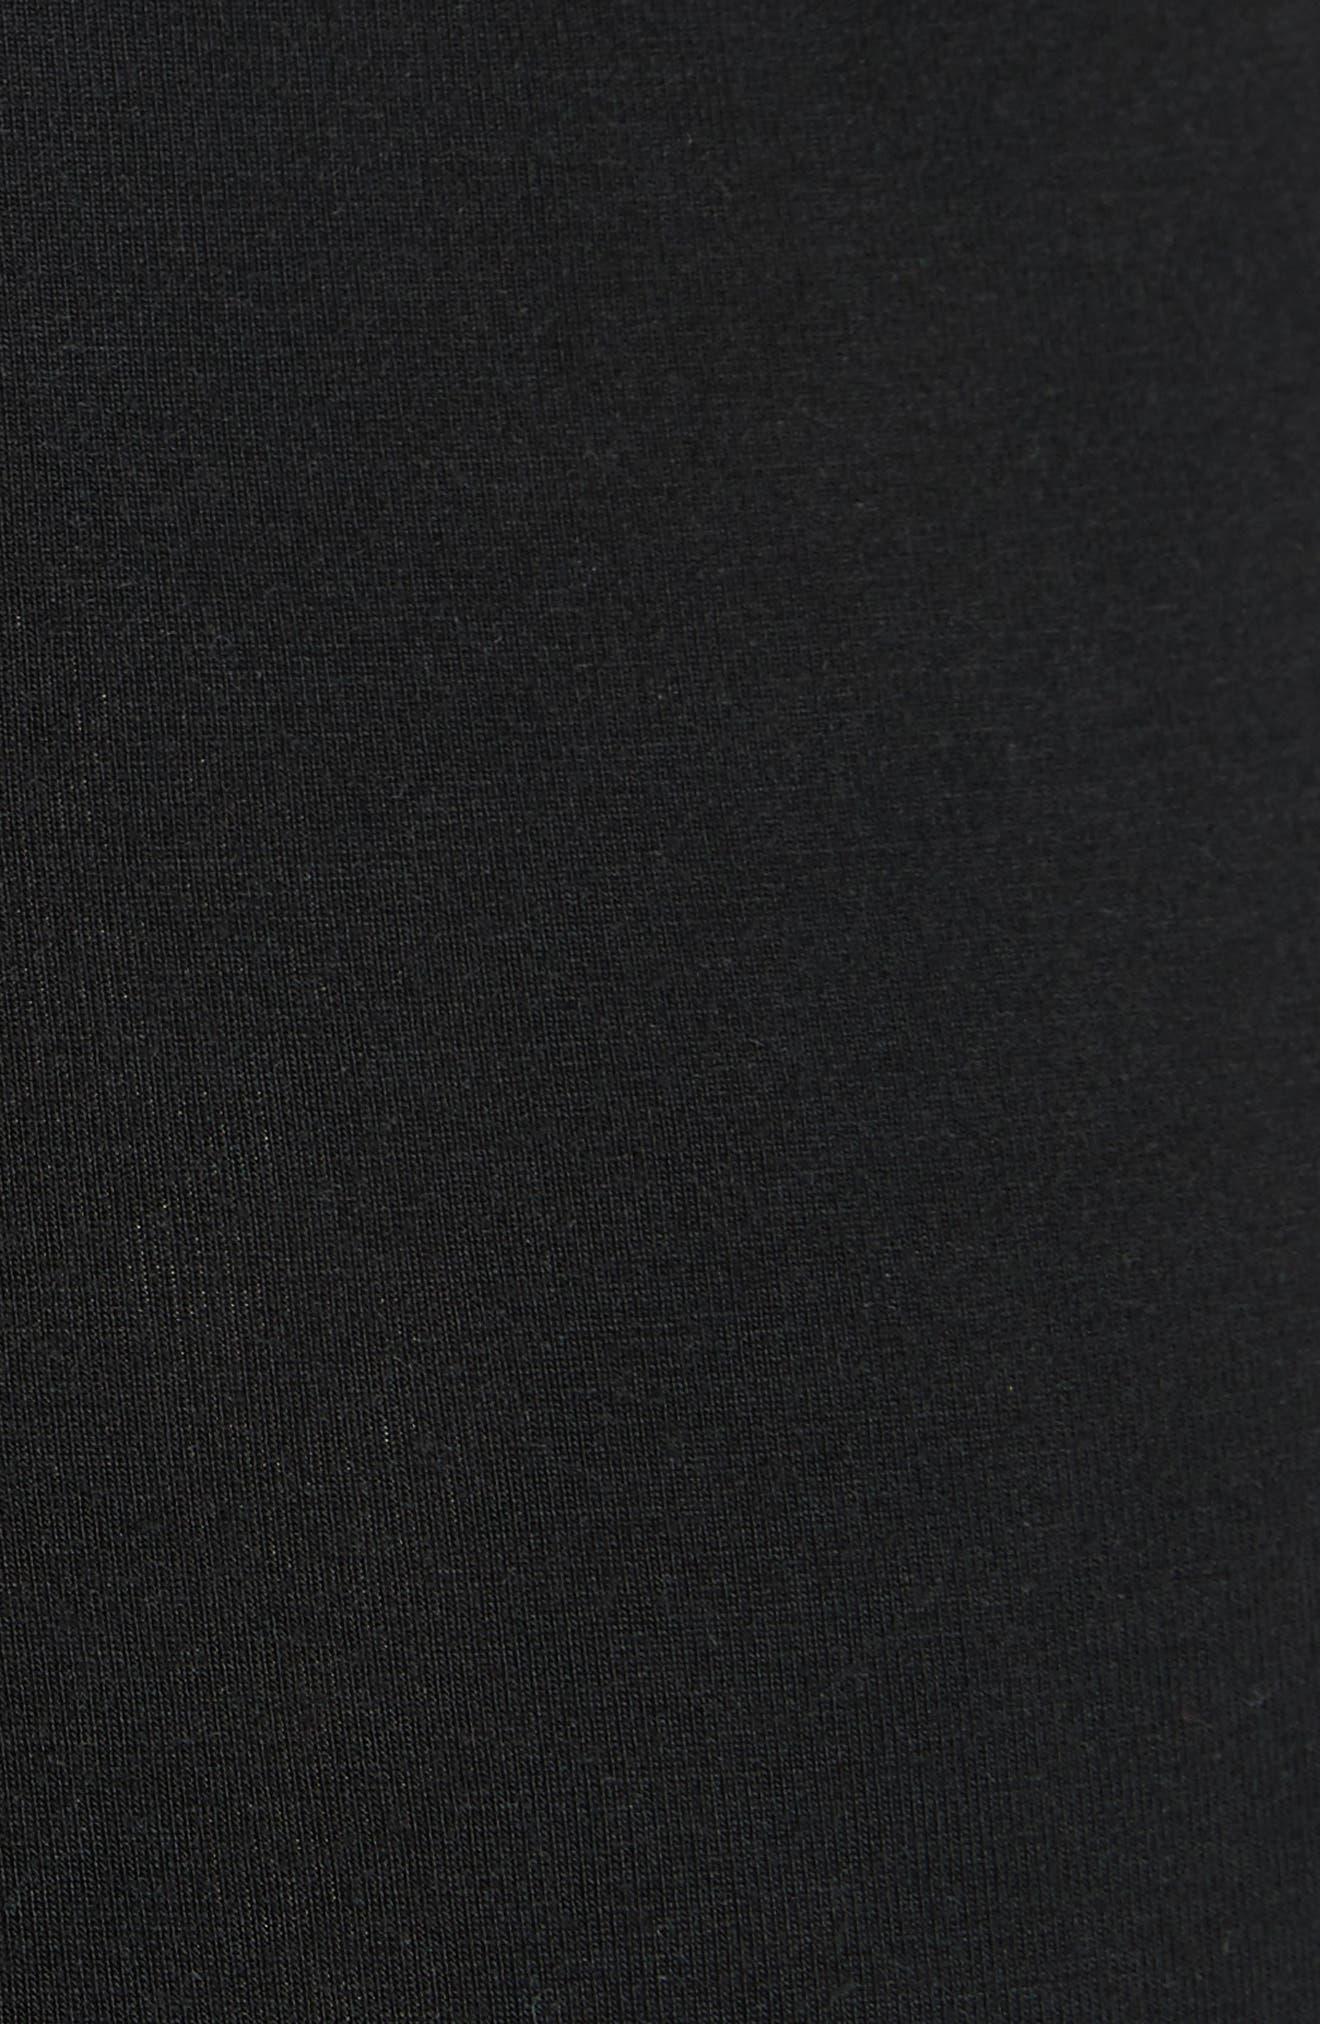 Keyhole Neck Body-Con Dress,                             Alternate thumbnail 5, color,                             Black